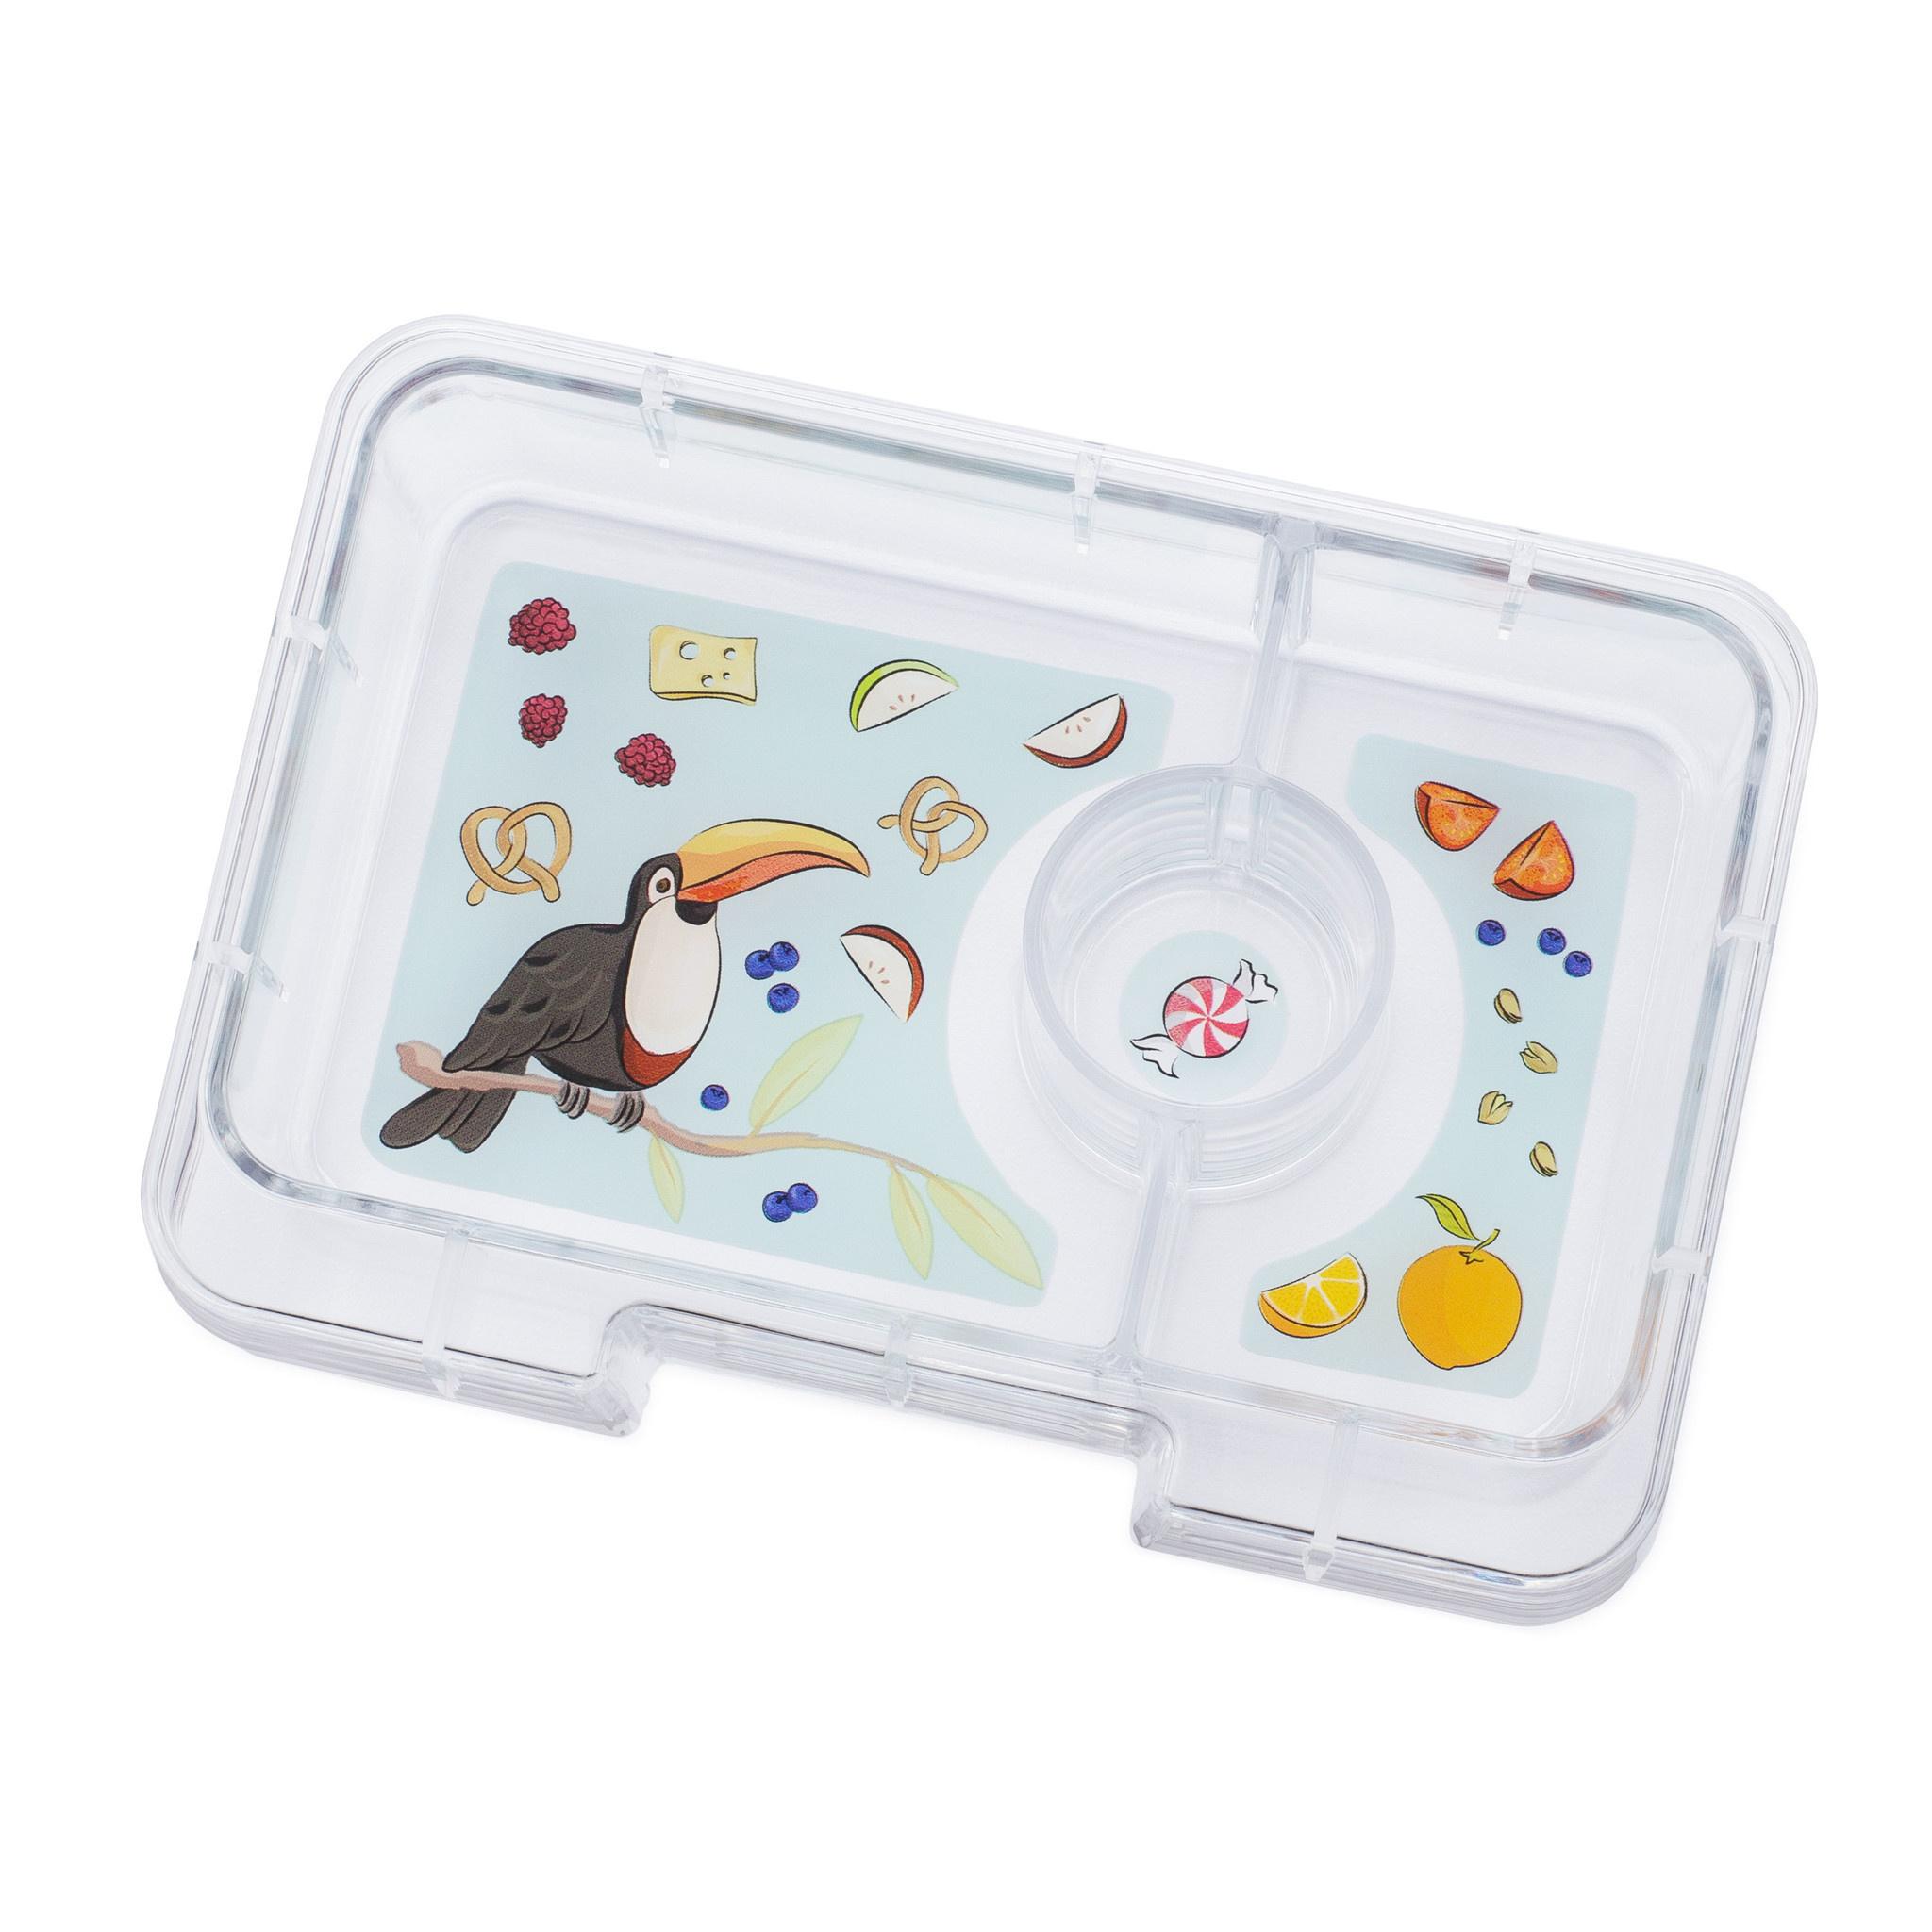 Yumbox MiniSnack box 3 sections Go Green (Avocado green) / Toucan tray-2